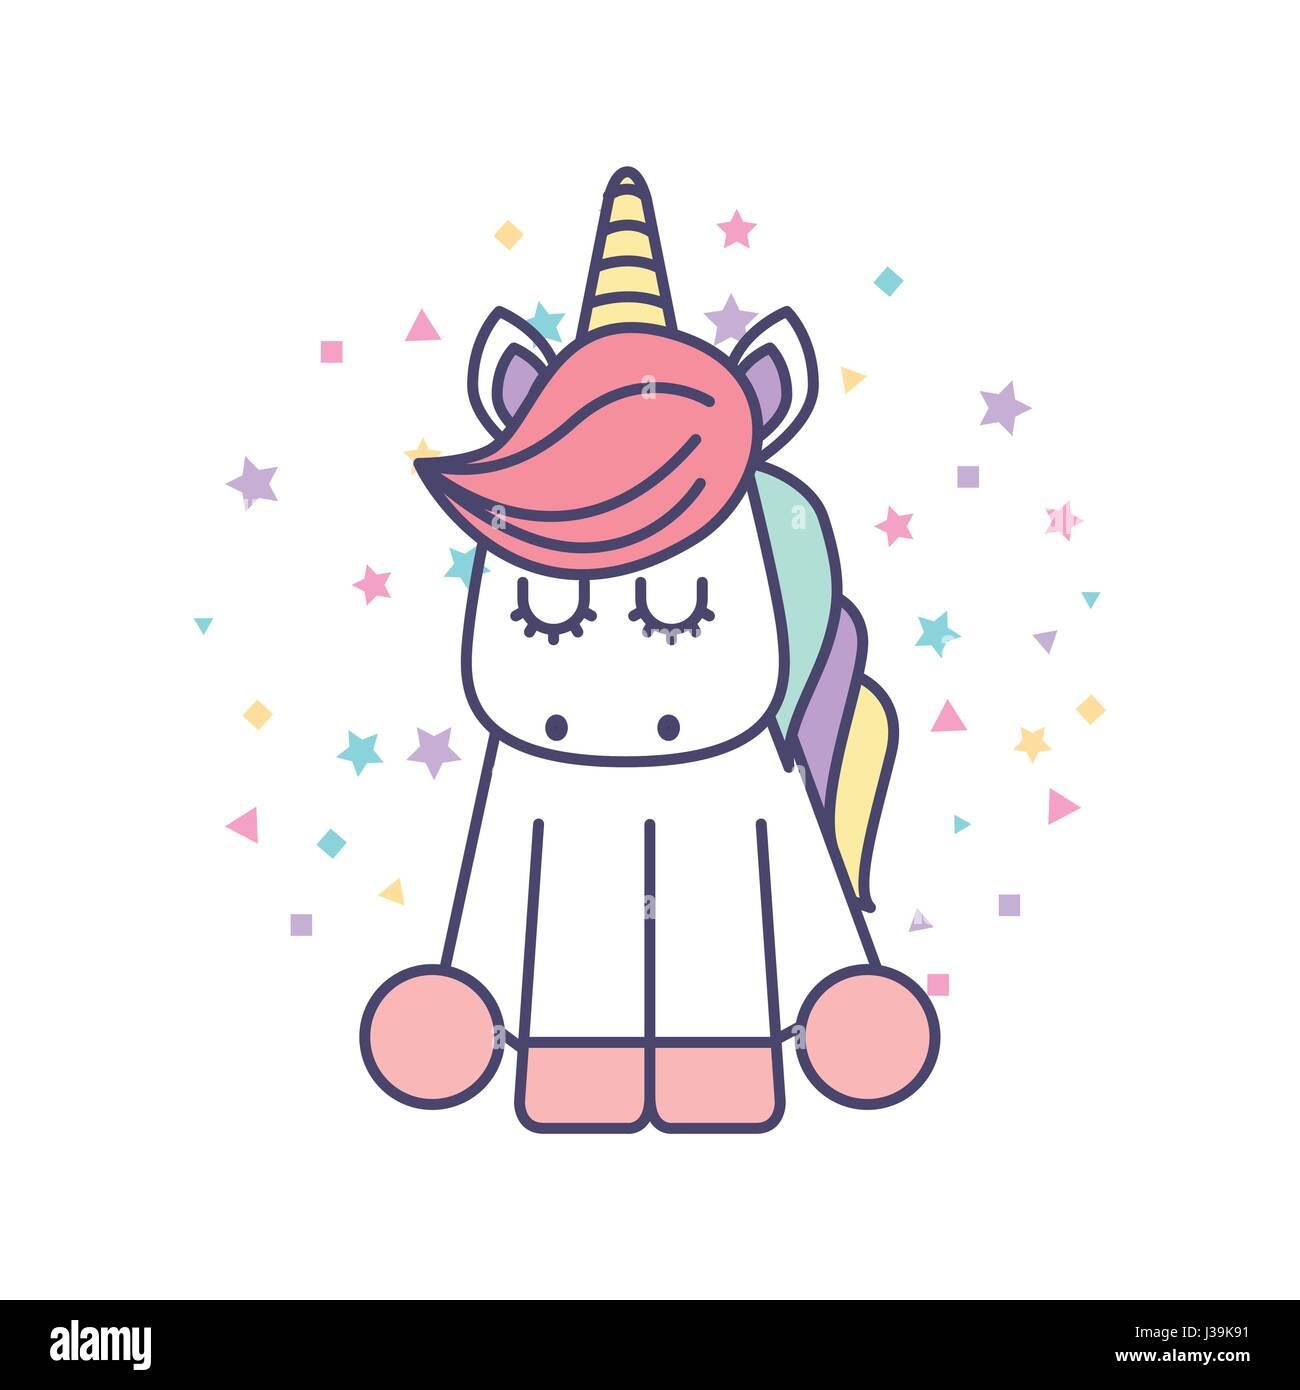 Drawing Cute Unicorn Icon Stock Vector Art Illustration